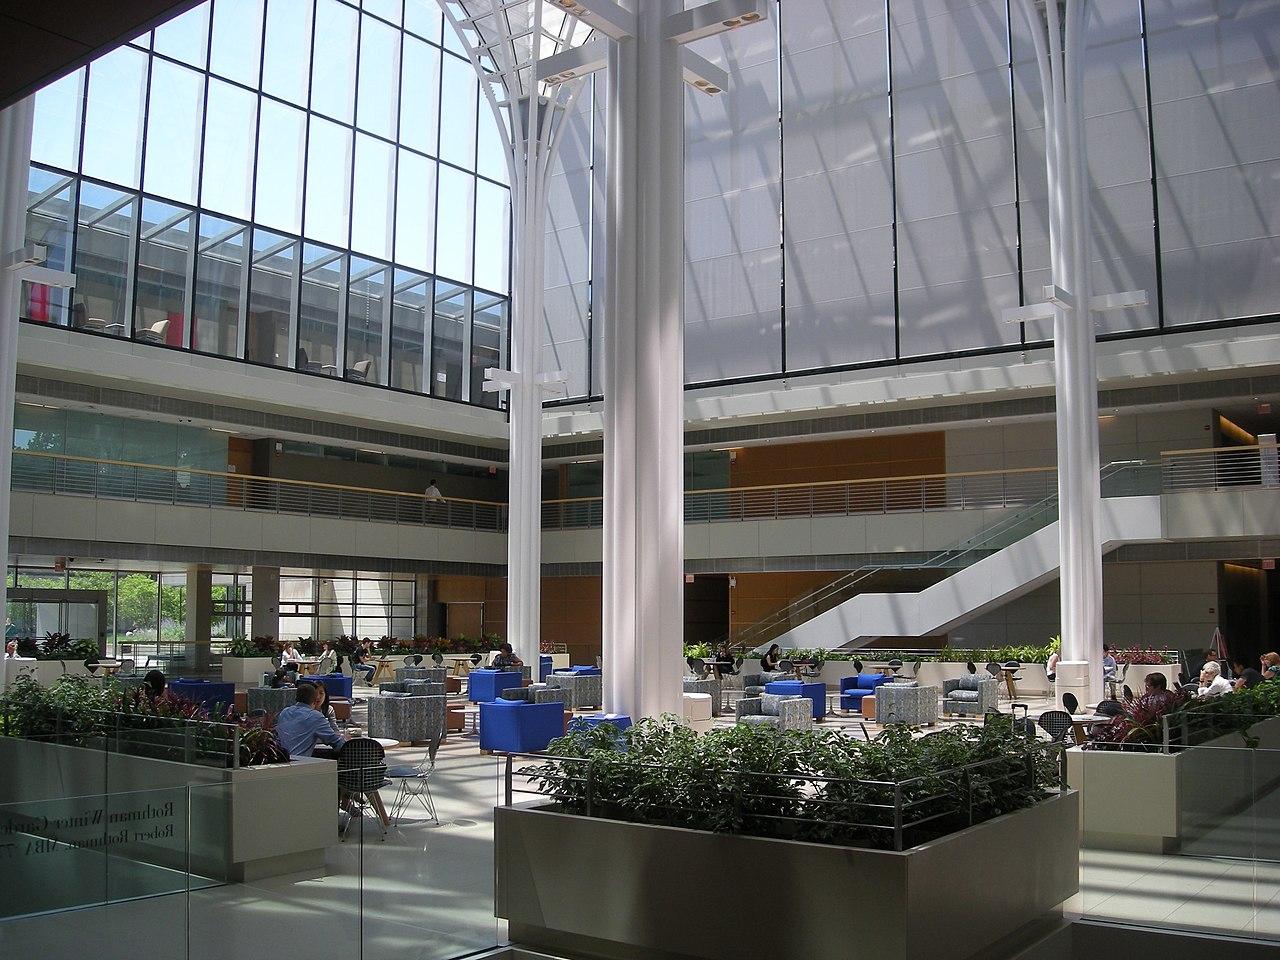 Bright sunlight fills a glass atrium.